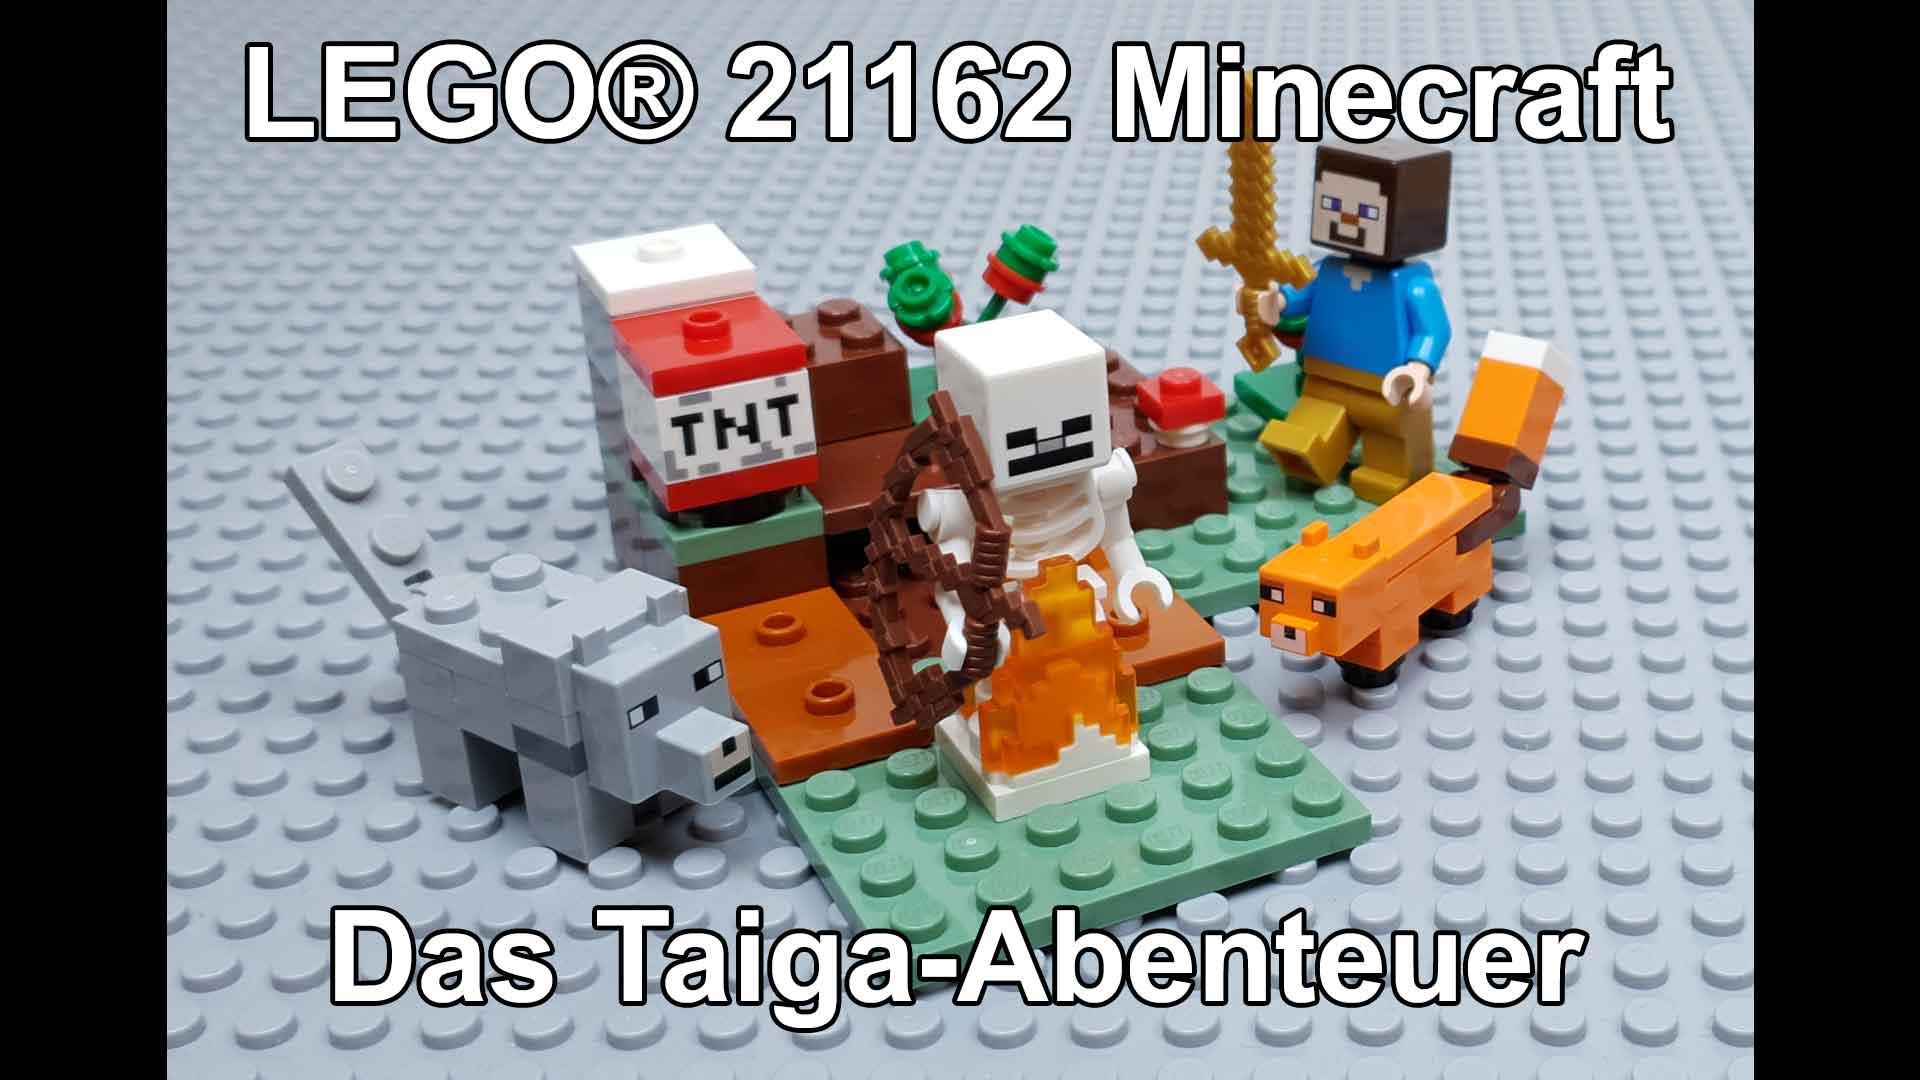 LEGO Minecraft: Das Taiga-Abenteuer